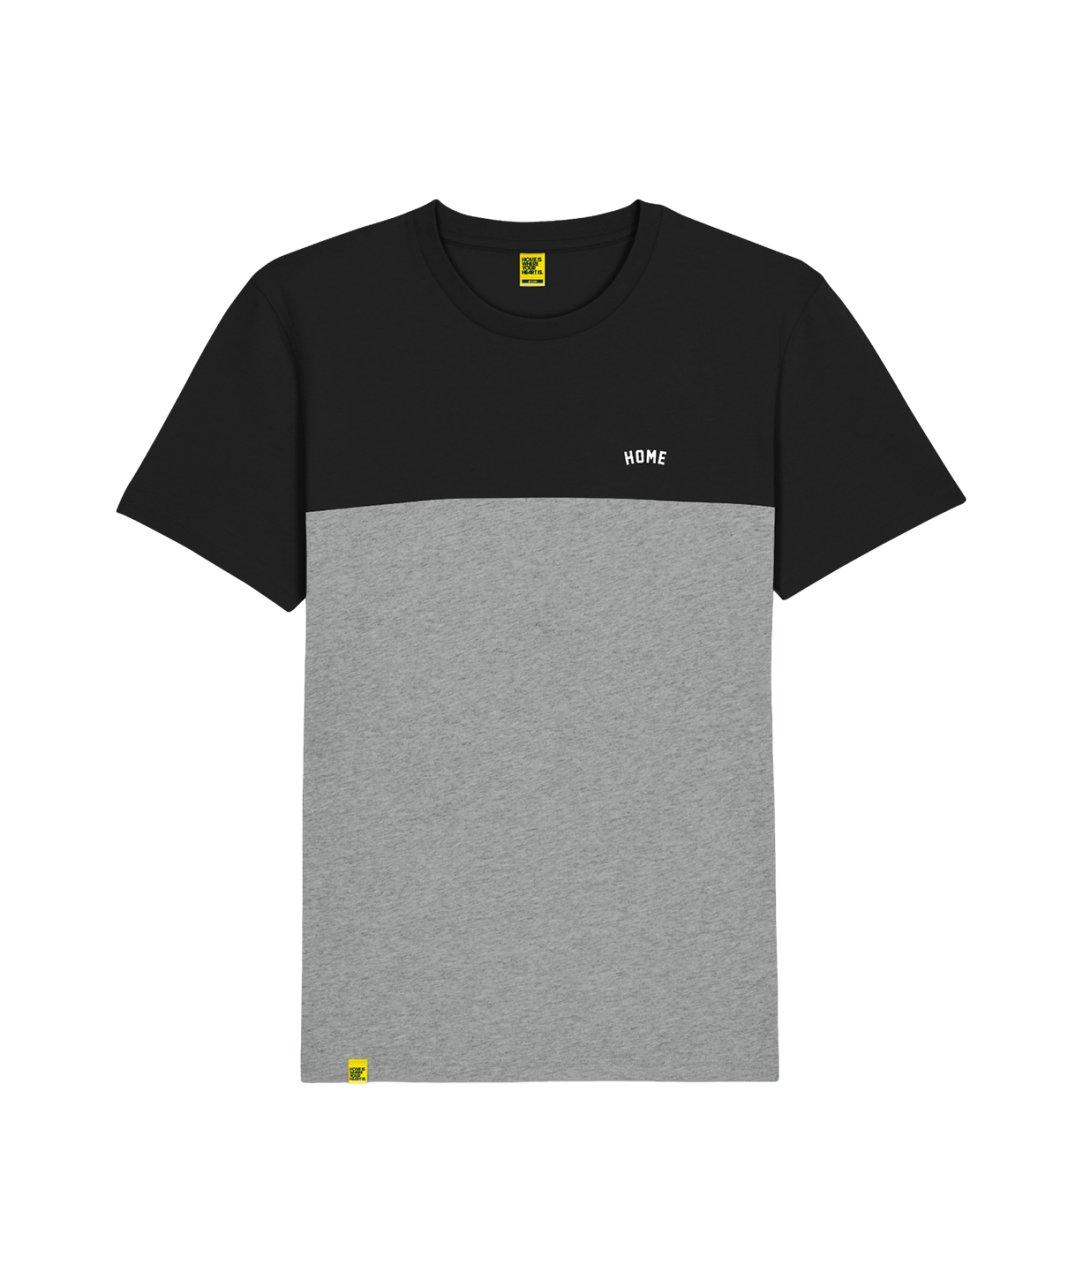 Home 2-Color T-Shirt